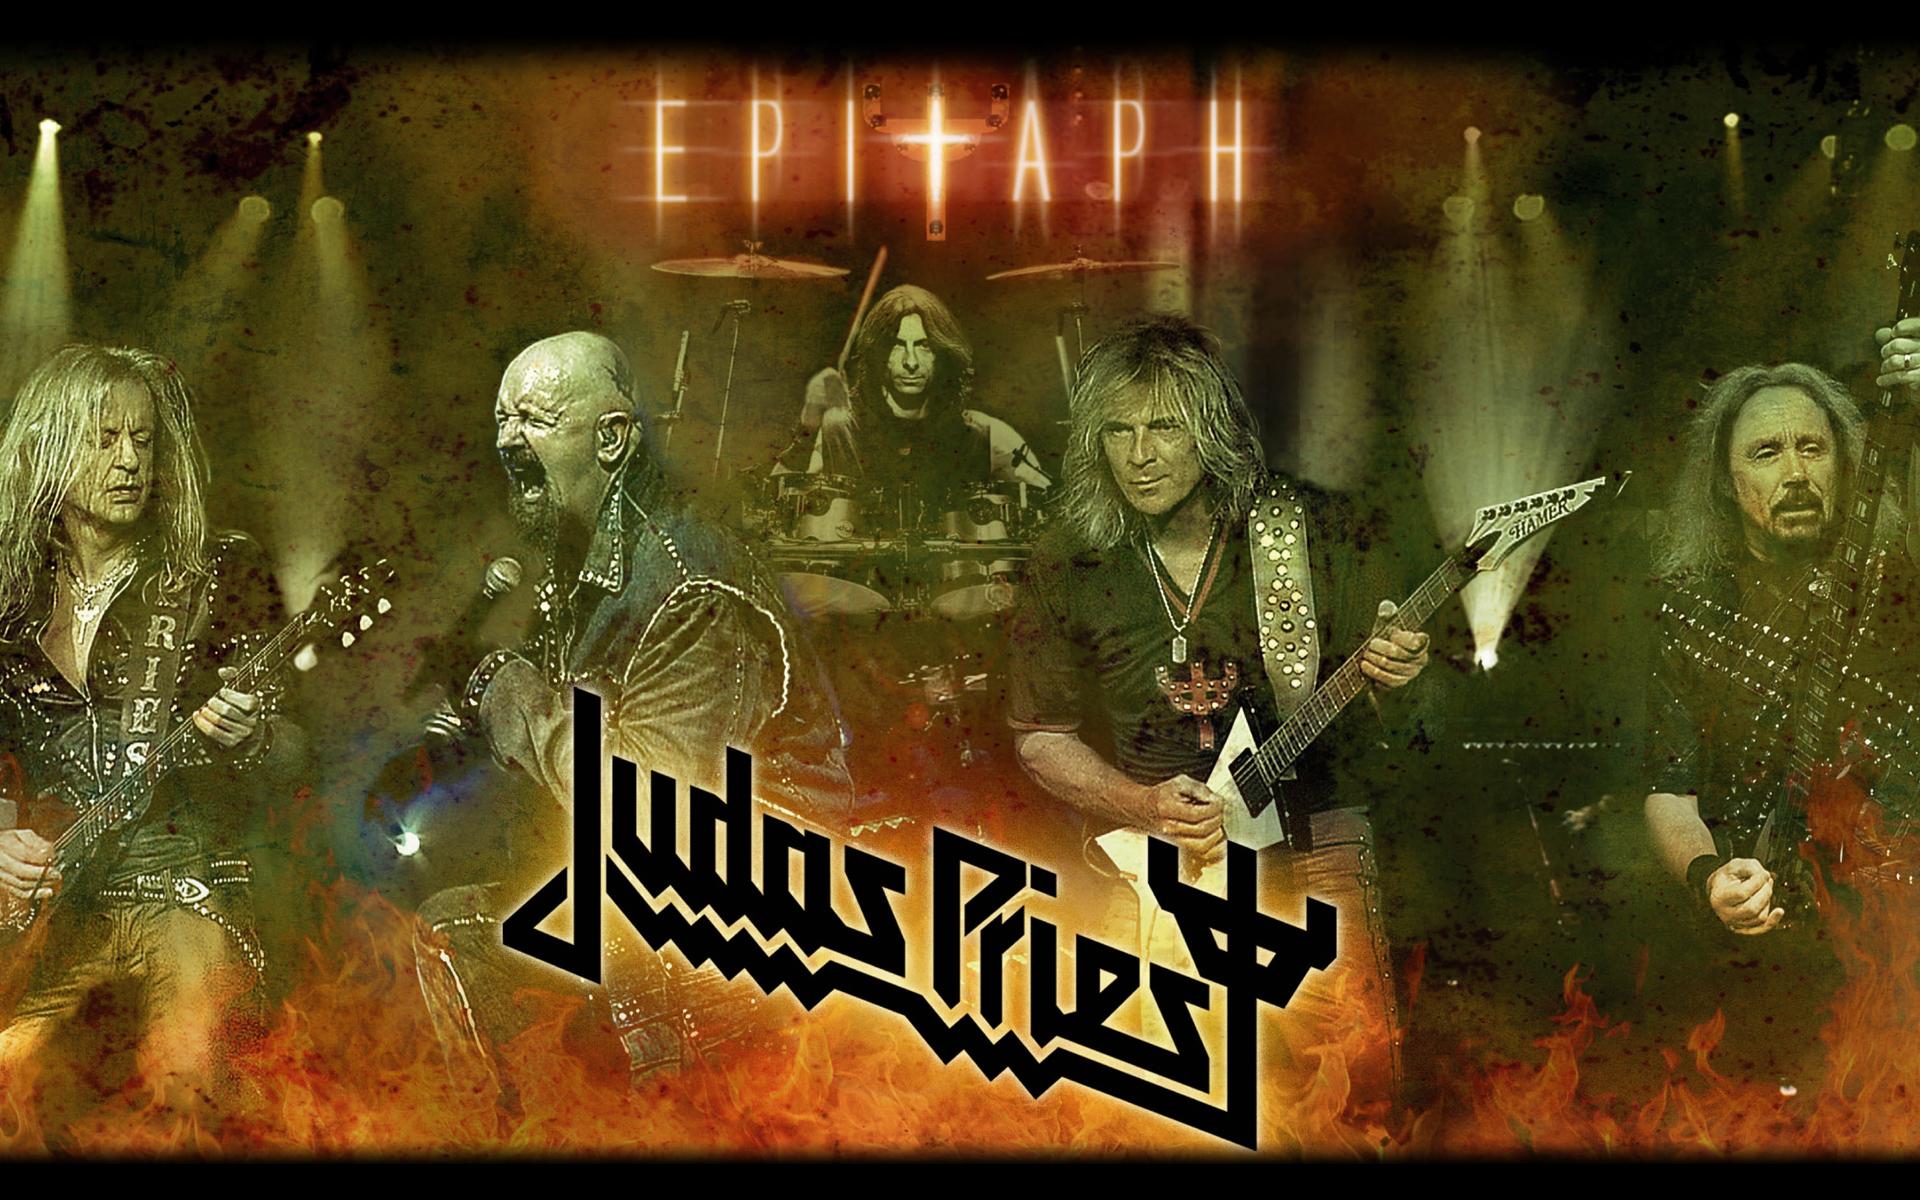 Judas Priest Fondo De Pantalla Hd Fondo De Escritorio